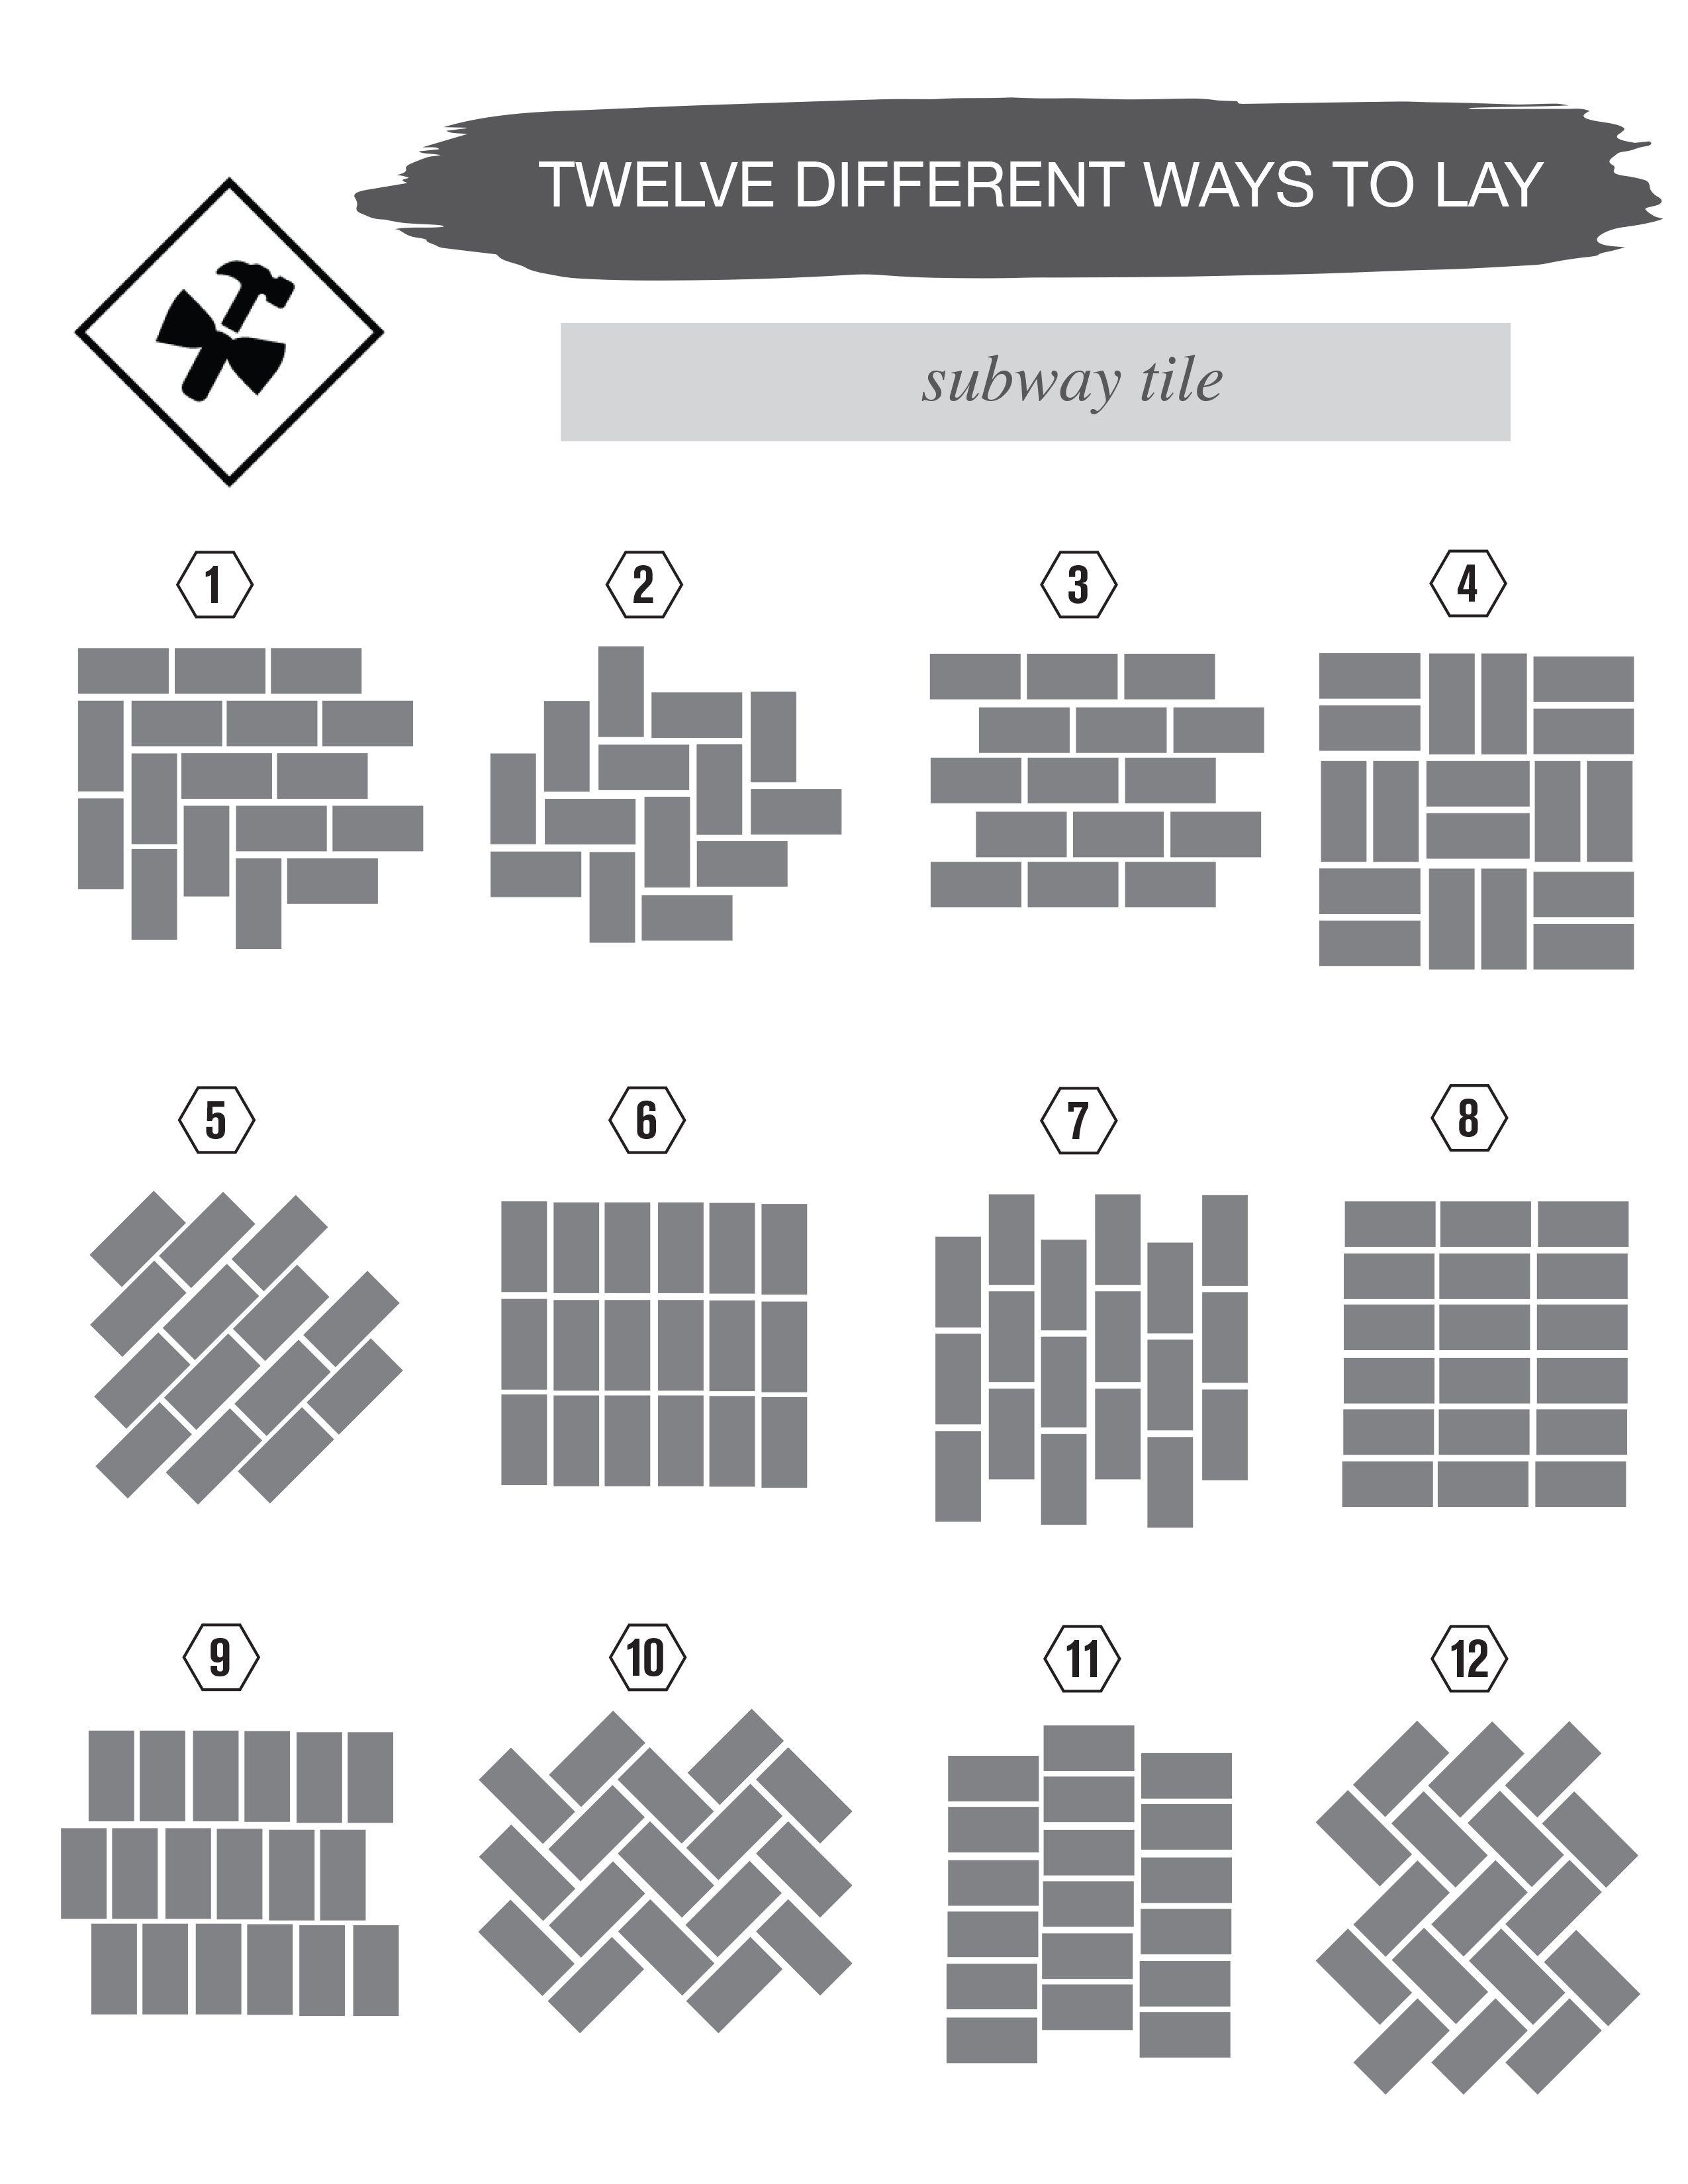 Subway Tile Patterns Subway Tile Design Subway Tile Patterns